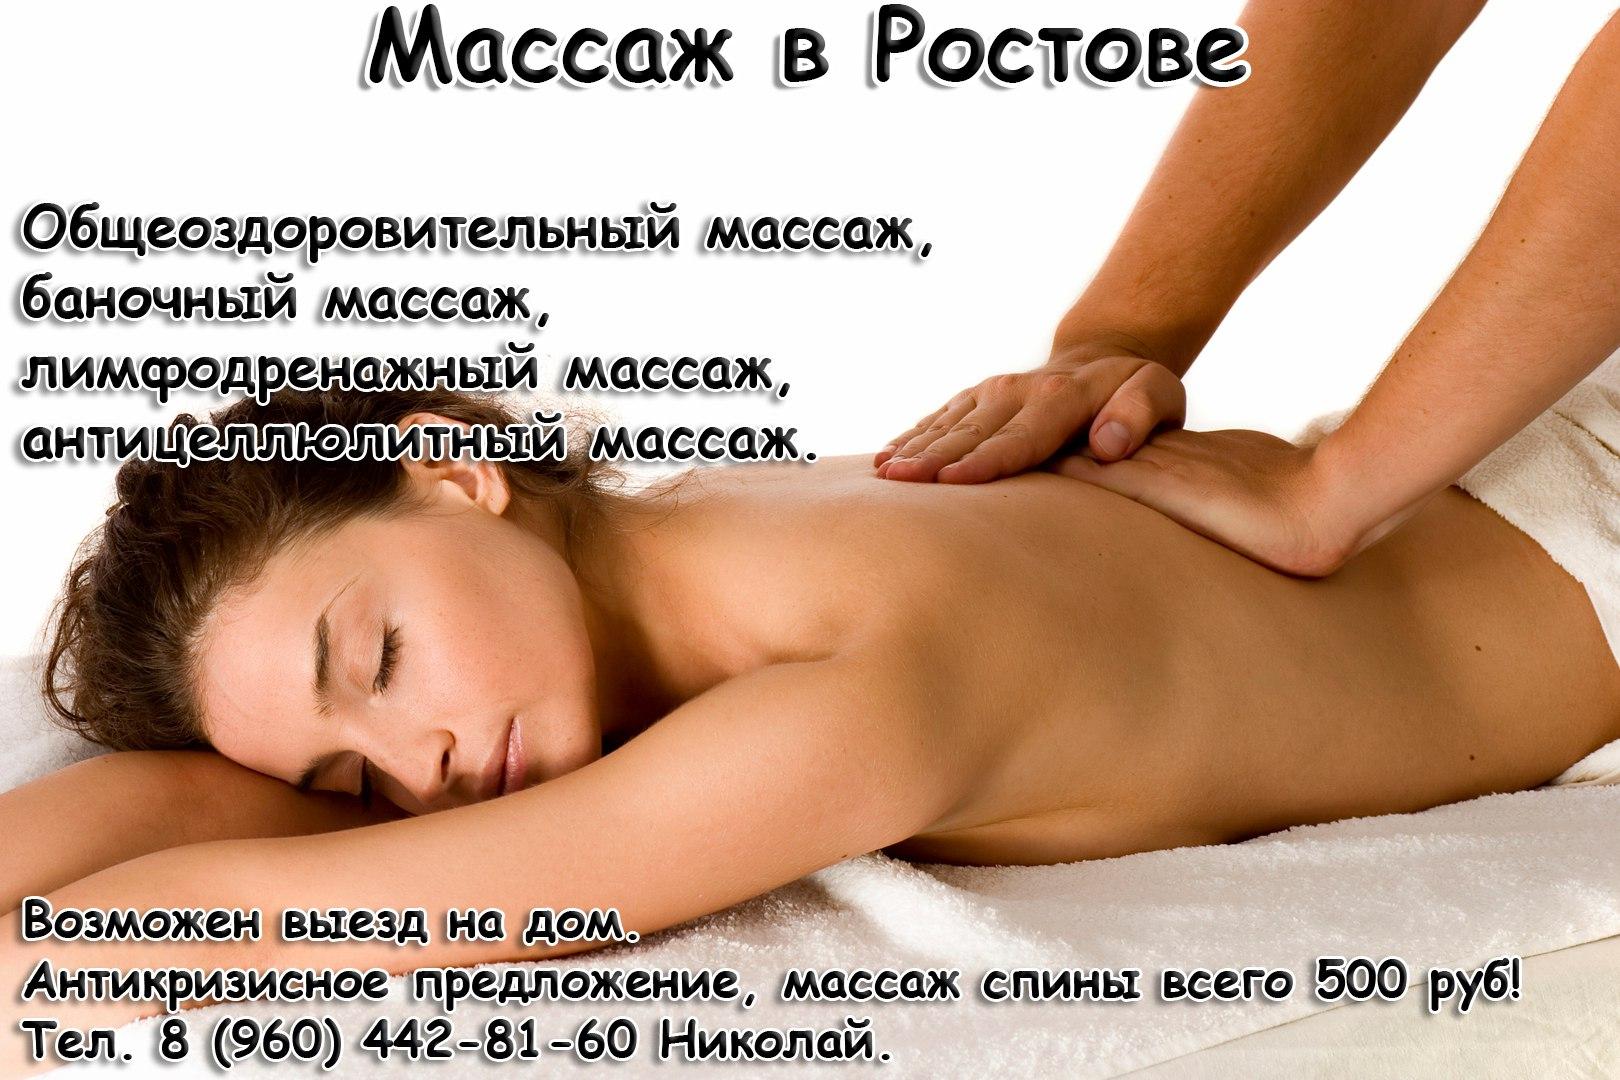 podrobnosti-eroticheskogo-massazha